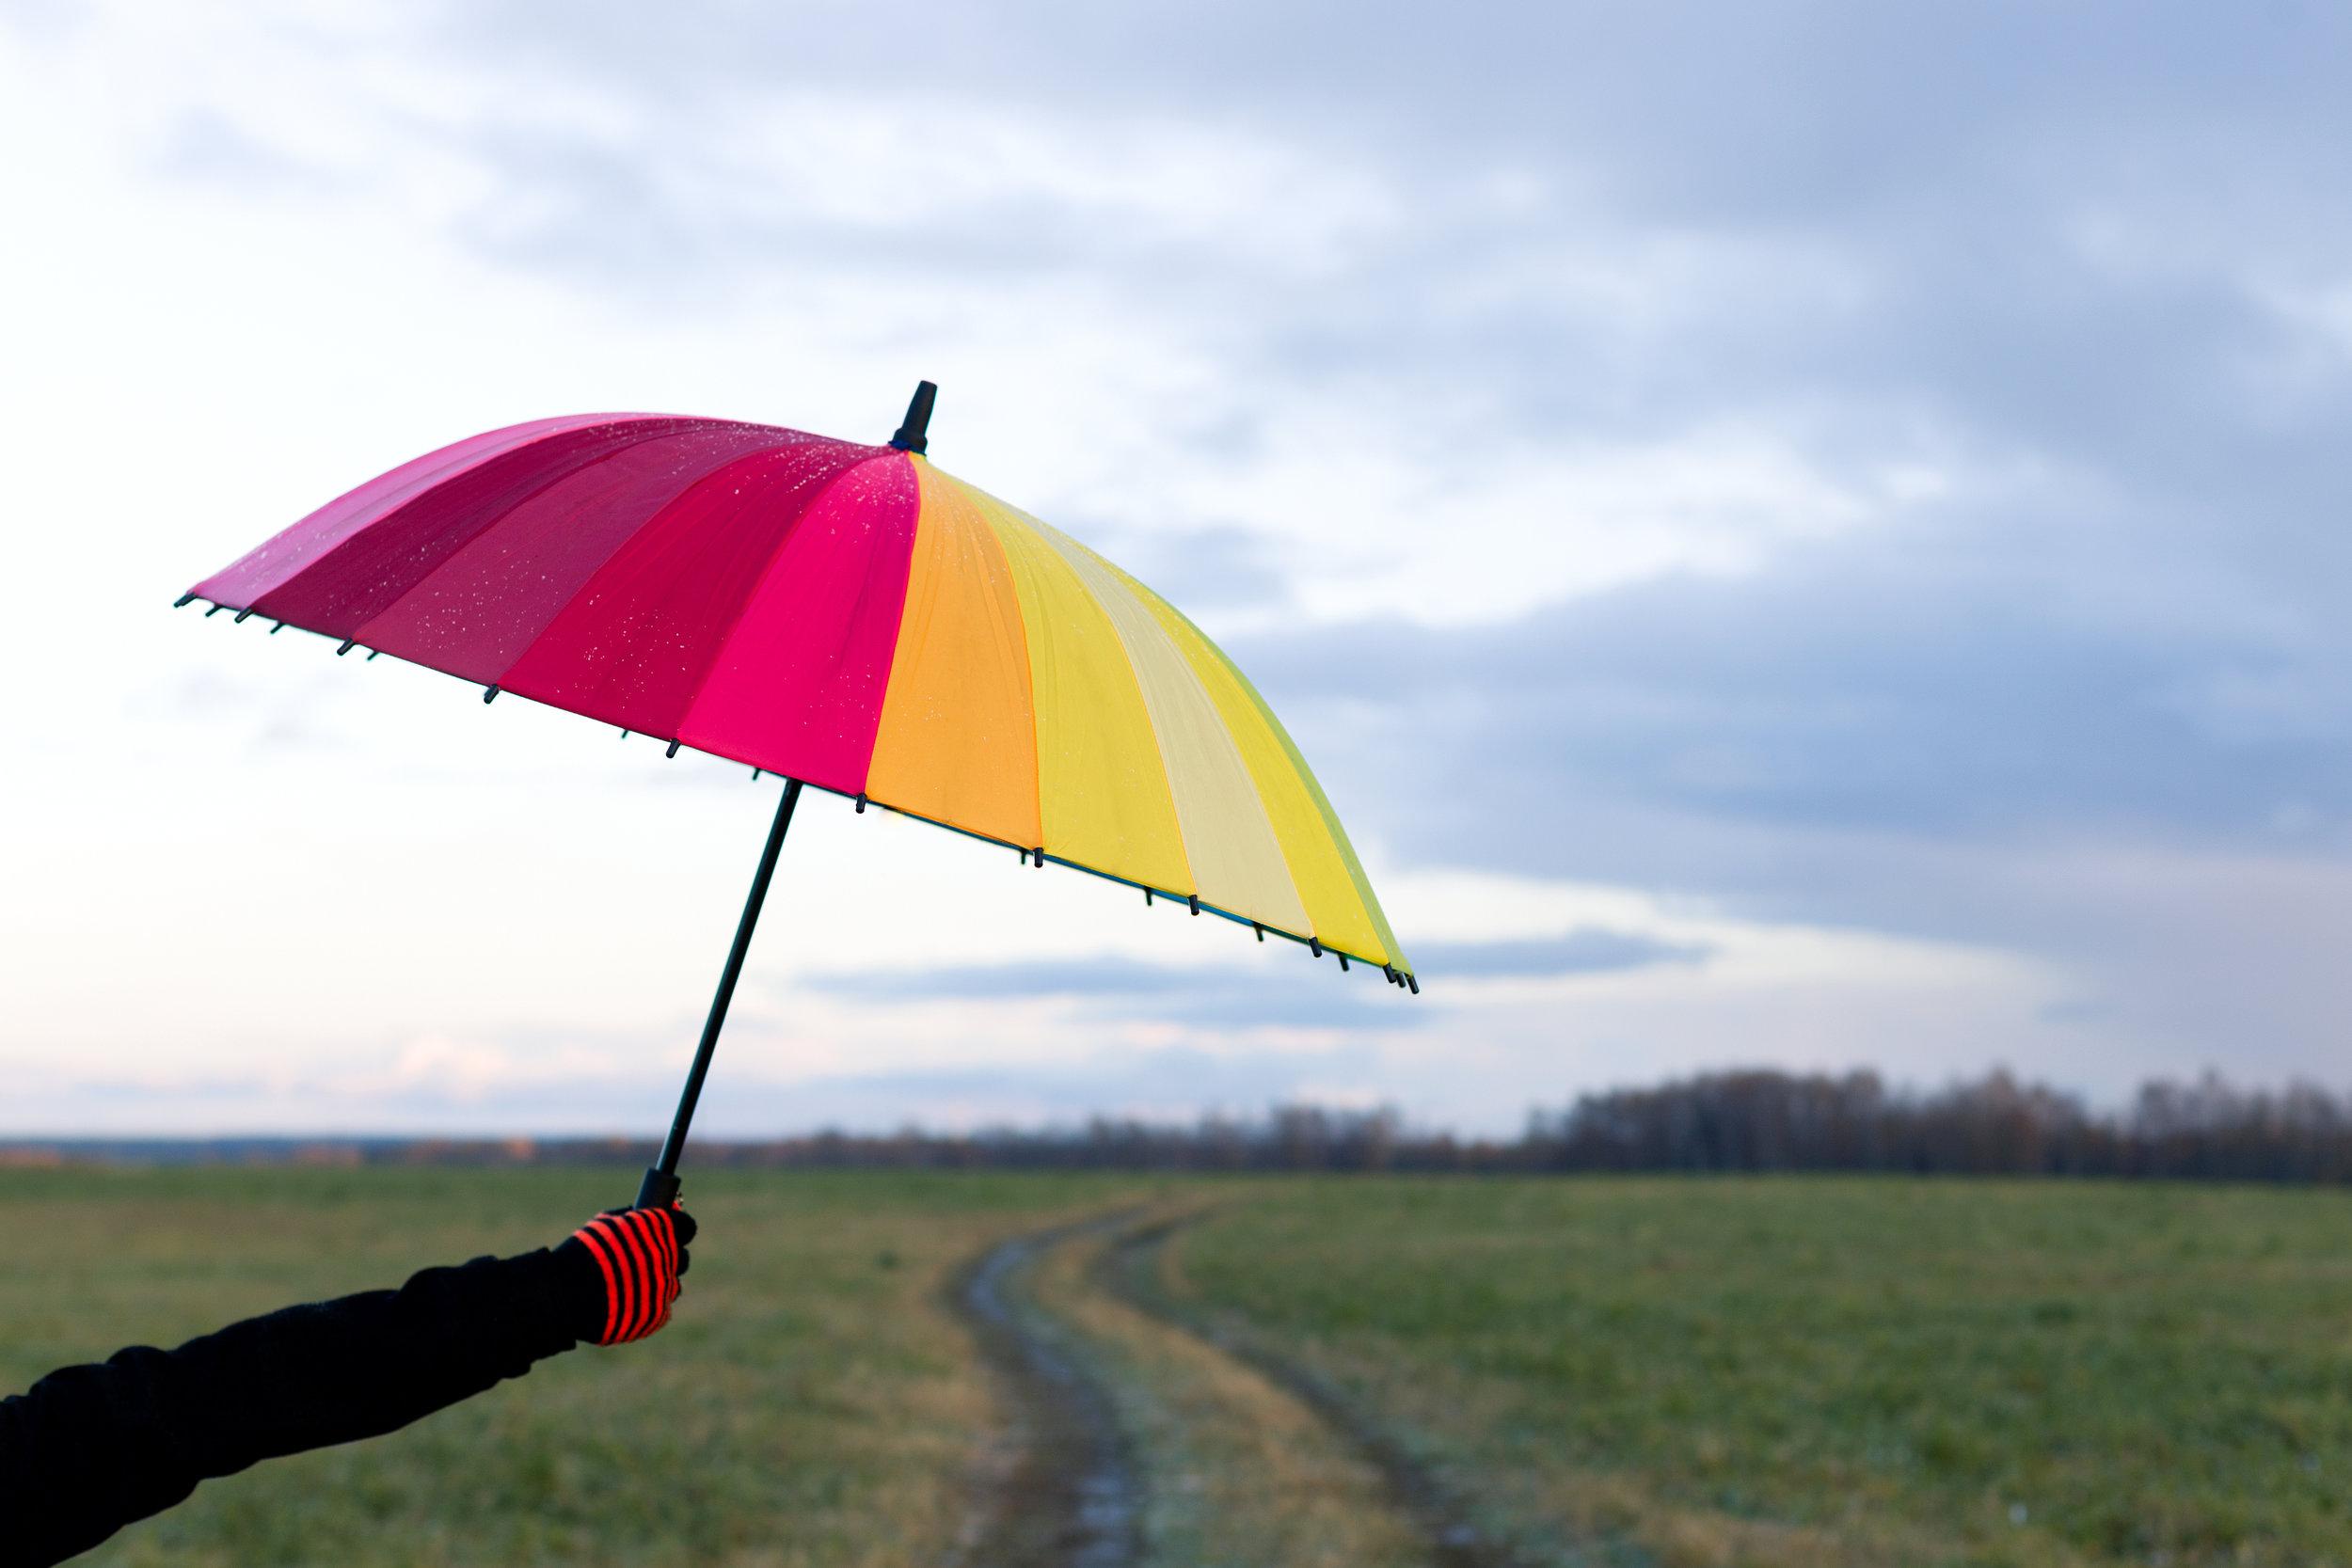 umbrella-in-hand-PDXYVRL.jpg